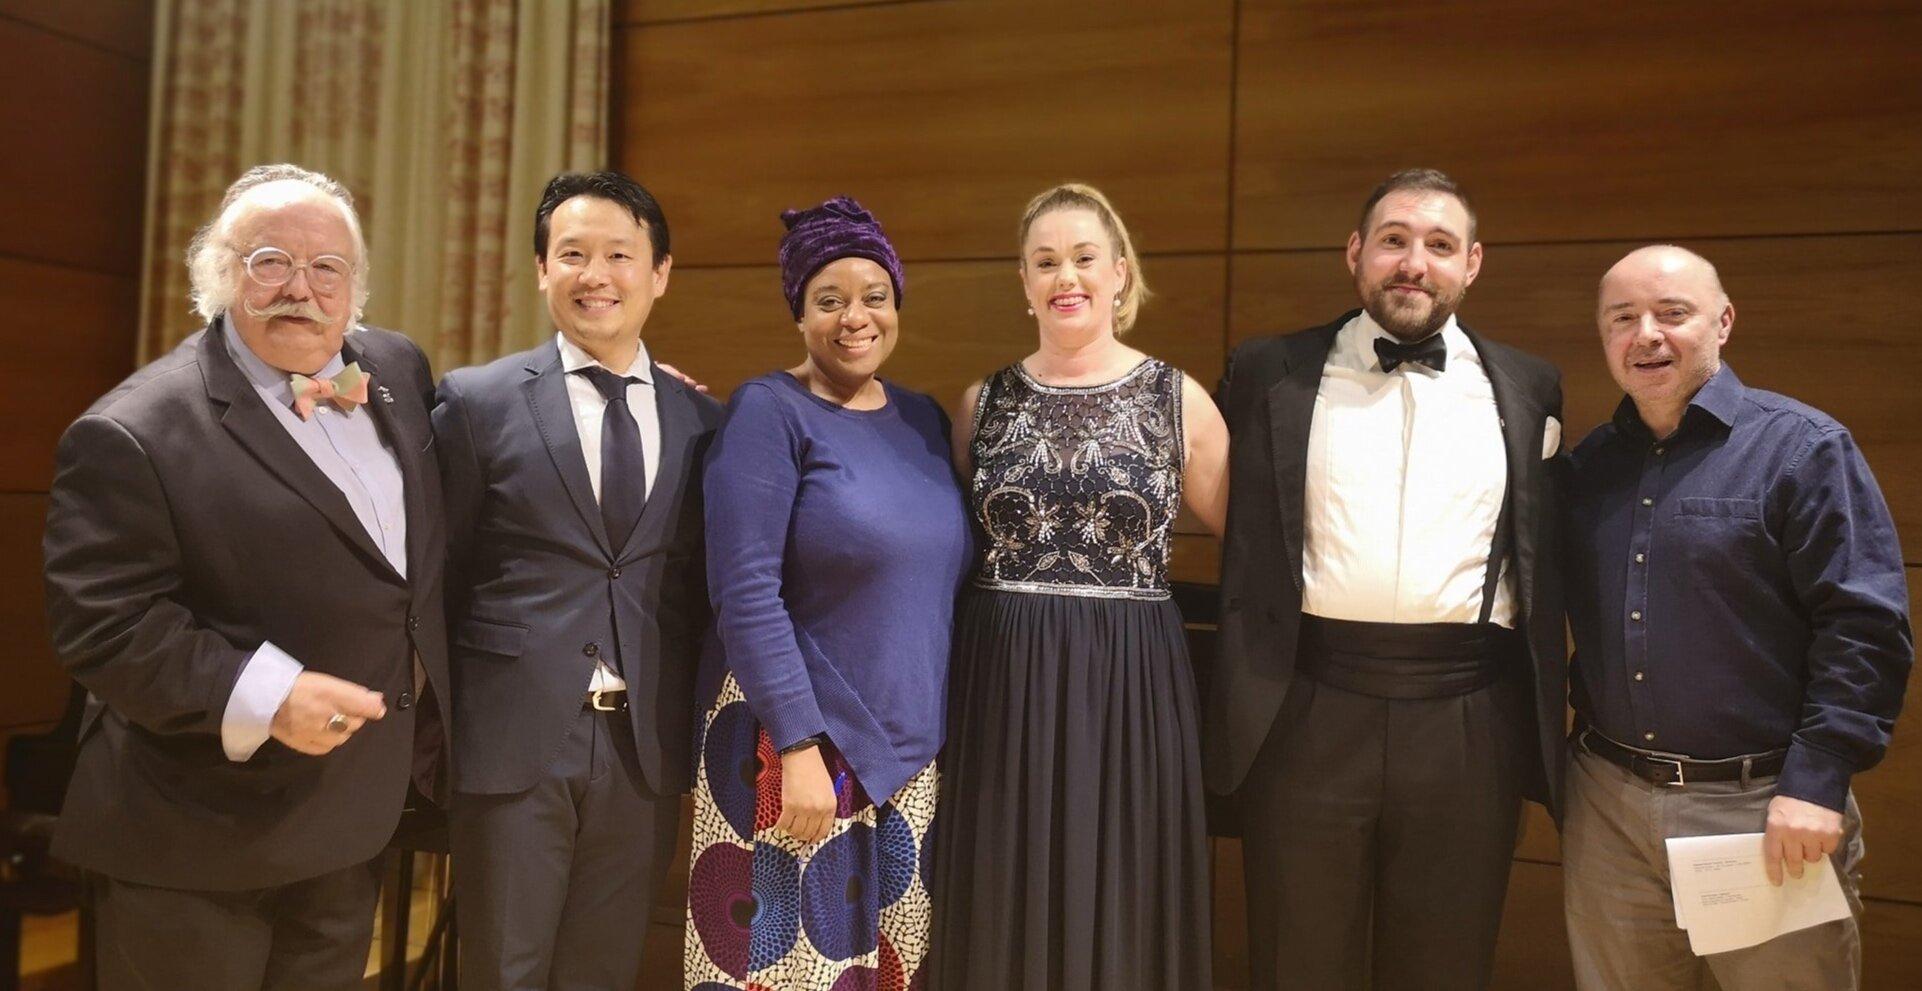 The Judges and Prizewinners: The 2019 Fulham Opera Robert Presley Memorial Verdi Prize